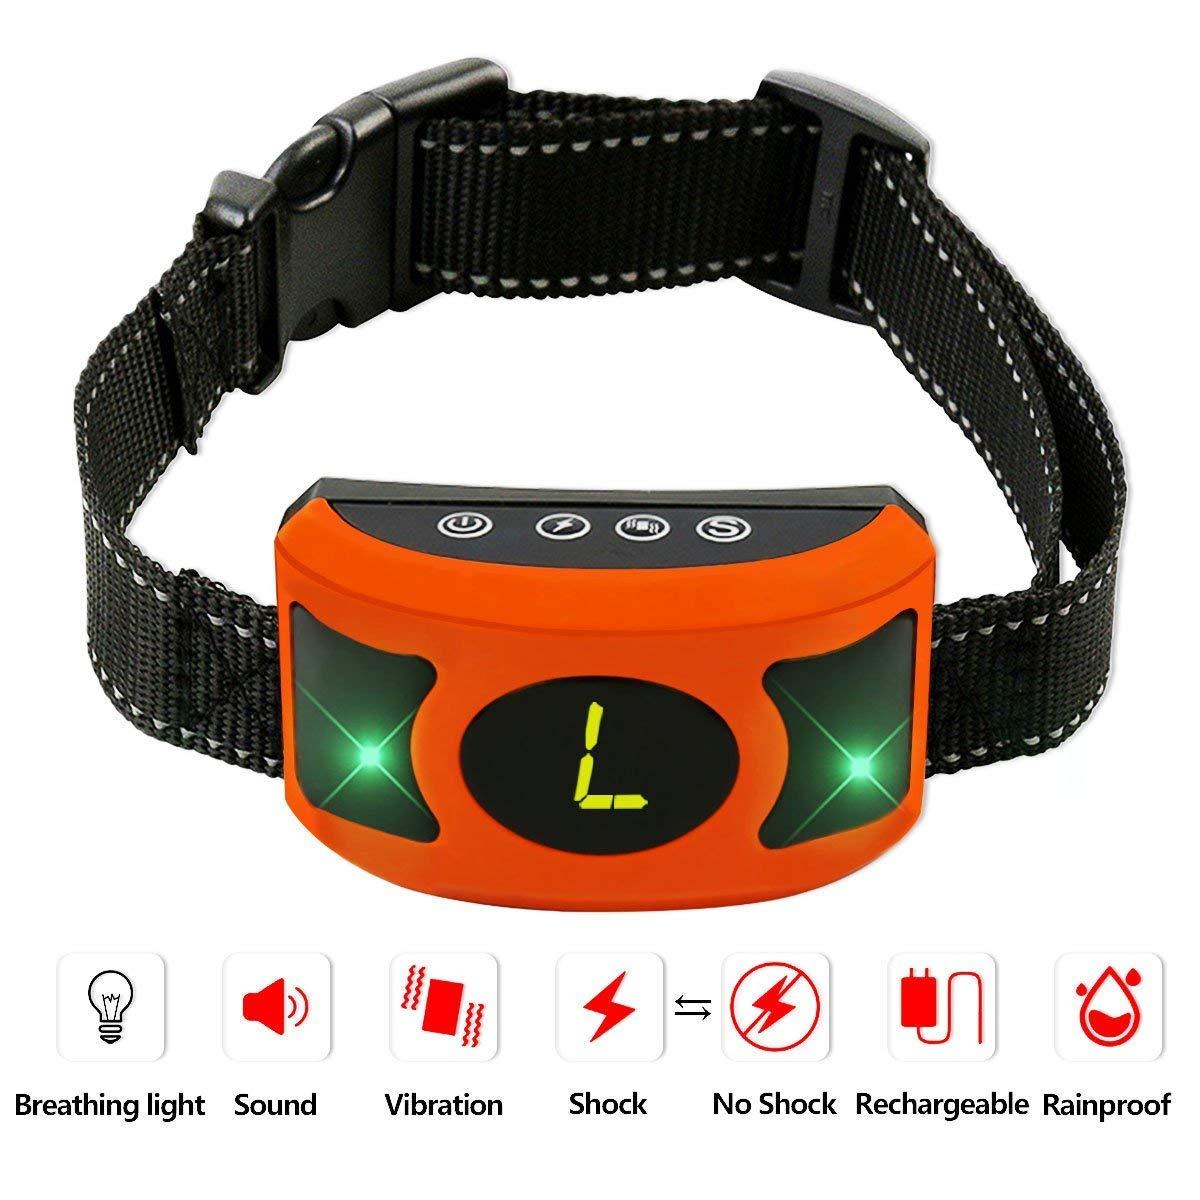 Pet Barking Control Training Collar, Adjustable Vibration, Dog Bark Collar, Rechargeable Waterproof, Smart Barking Detection Small Large Dog